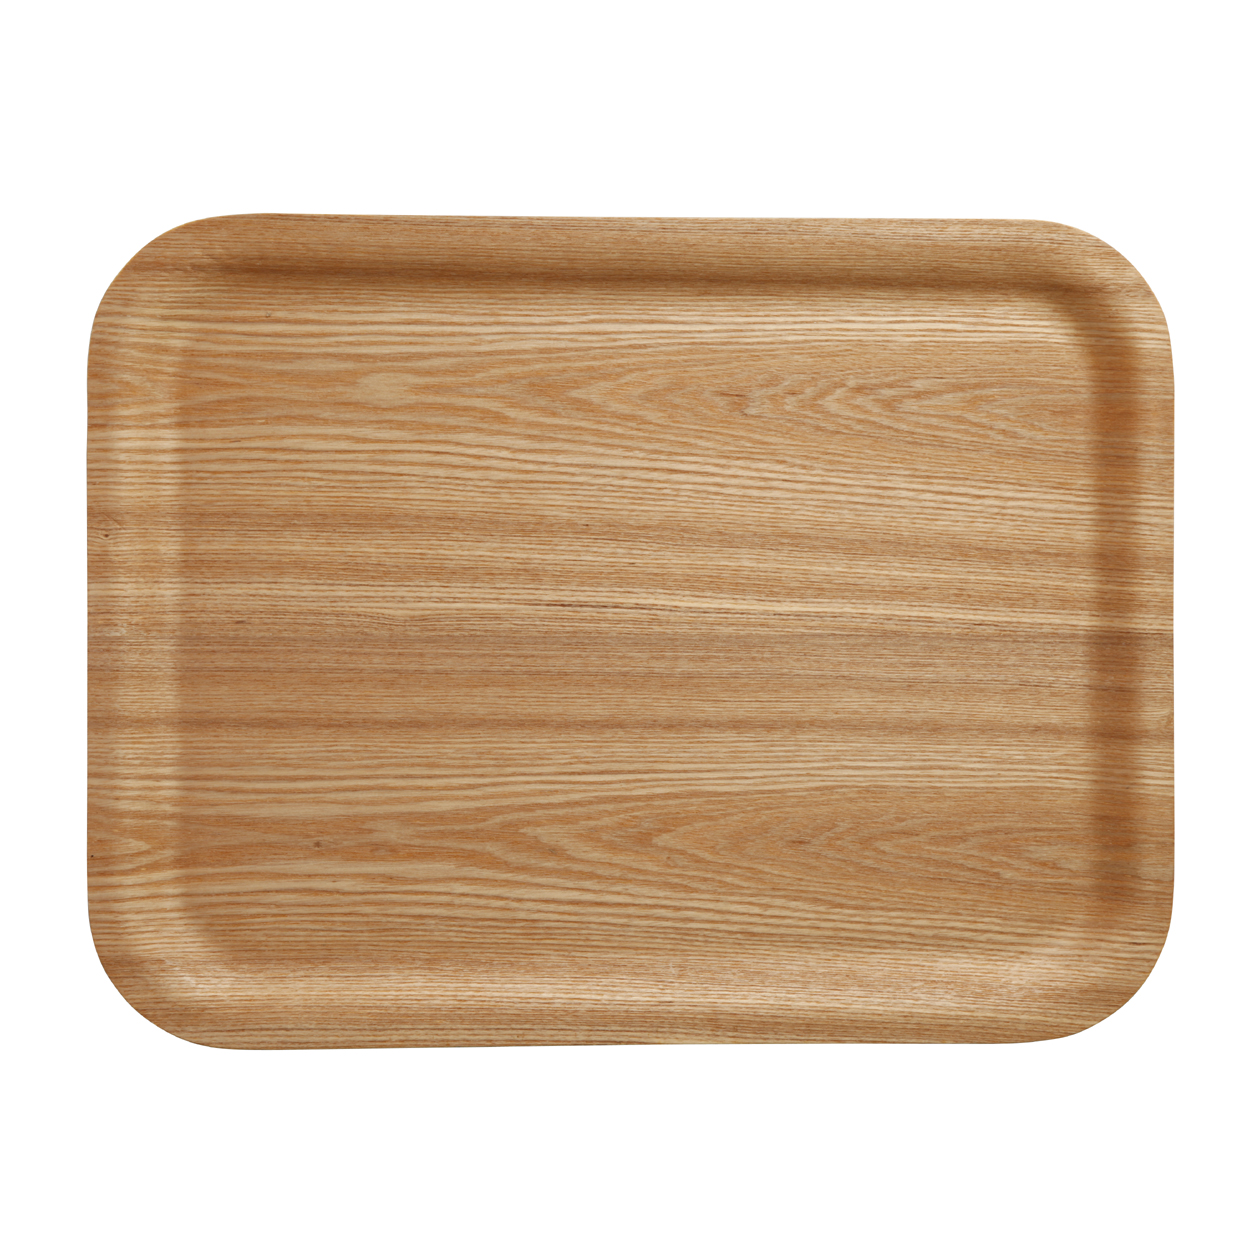 RoomClip商品情報 - 木製トレー・タモ